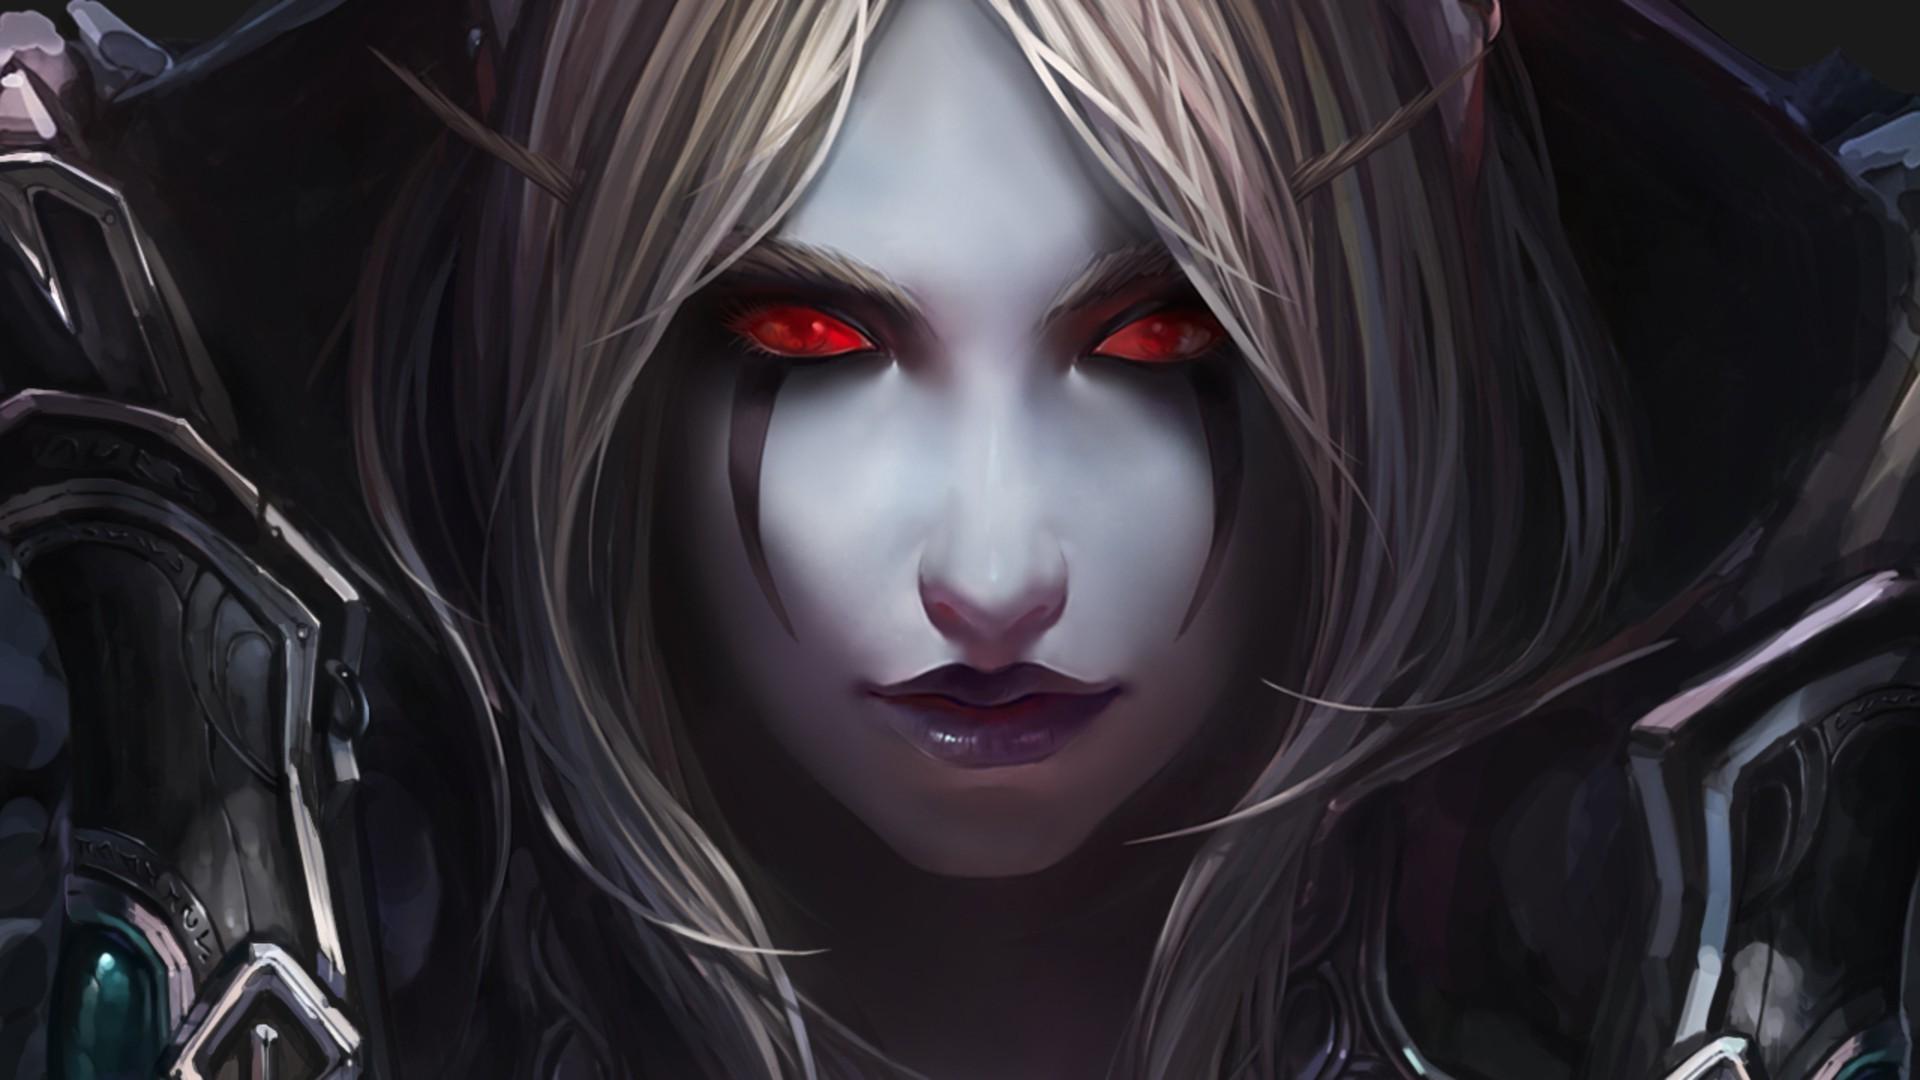 World Of Warcraft, Elves, Chenbo, Undead, Sylvanas Windrunner Wallpapers HD  / Desktop and Mobile Backgrounds